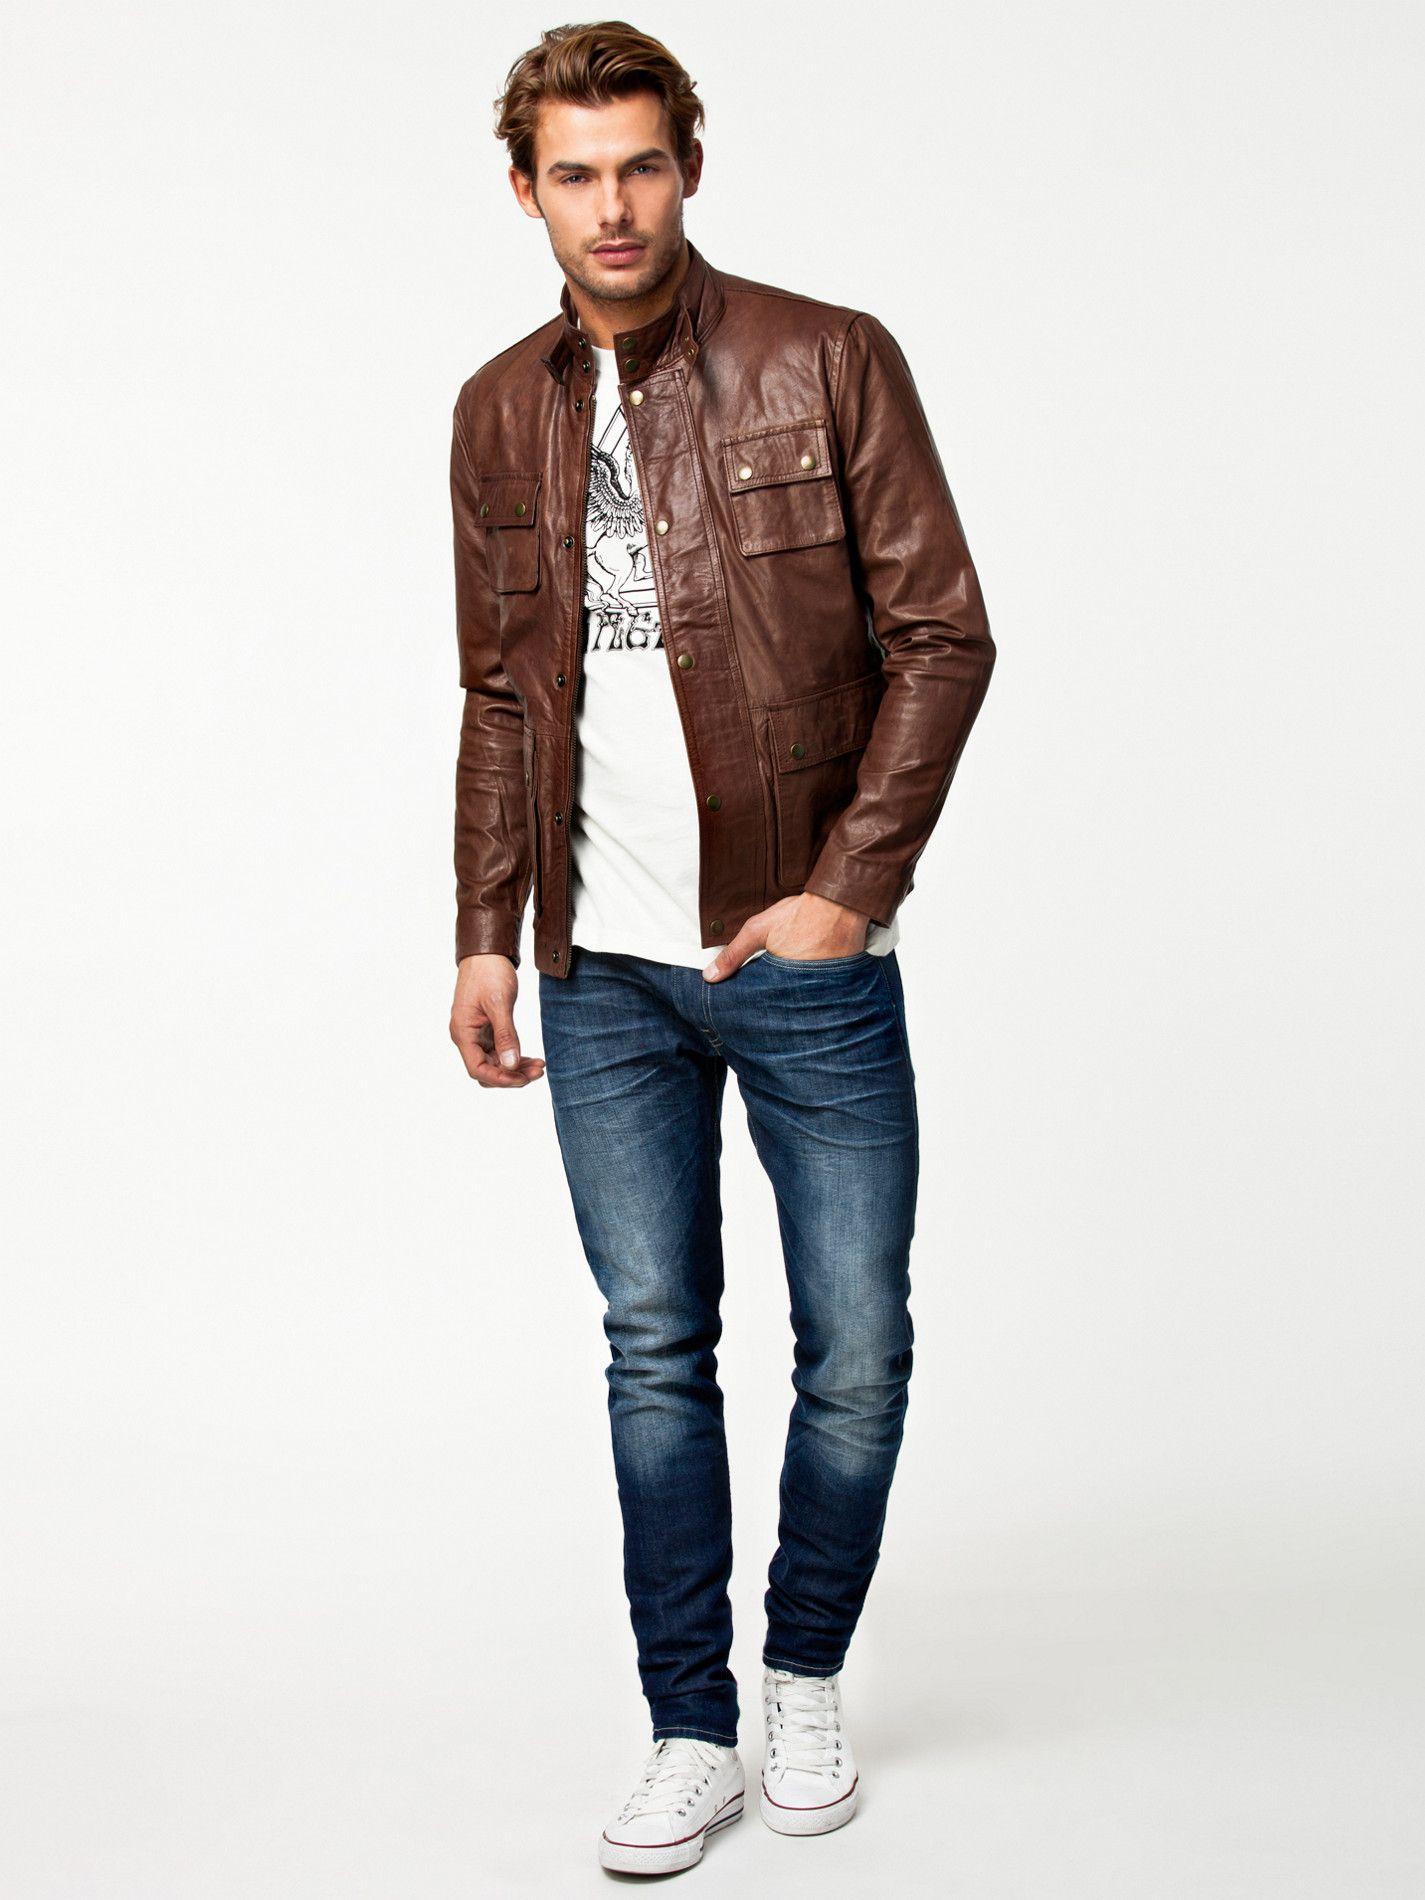 Leather jacket jack and jones - Napoli Leather Jacket Premium Tech By Jack Jones Brown Jackets And Coats